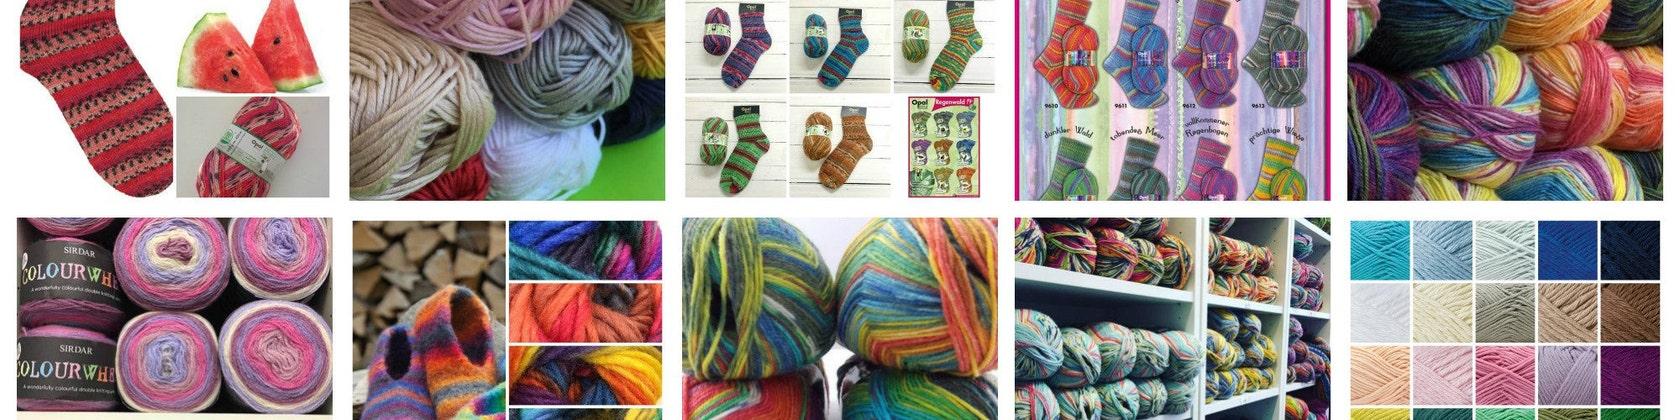 Sockyarn Knitting Crochet Search Press Books By Purplevalleyyarn